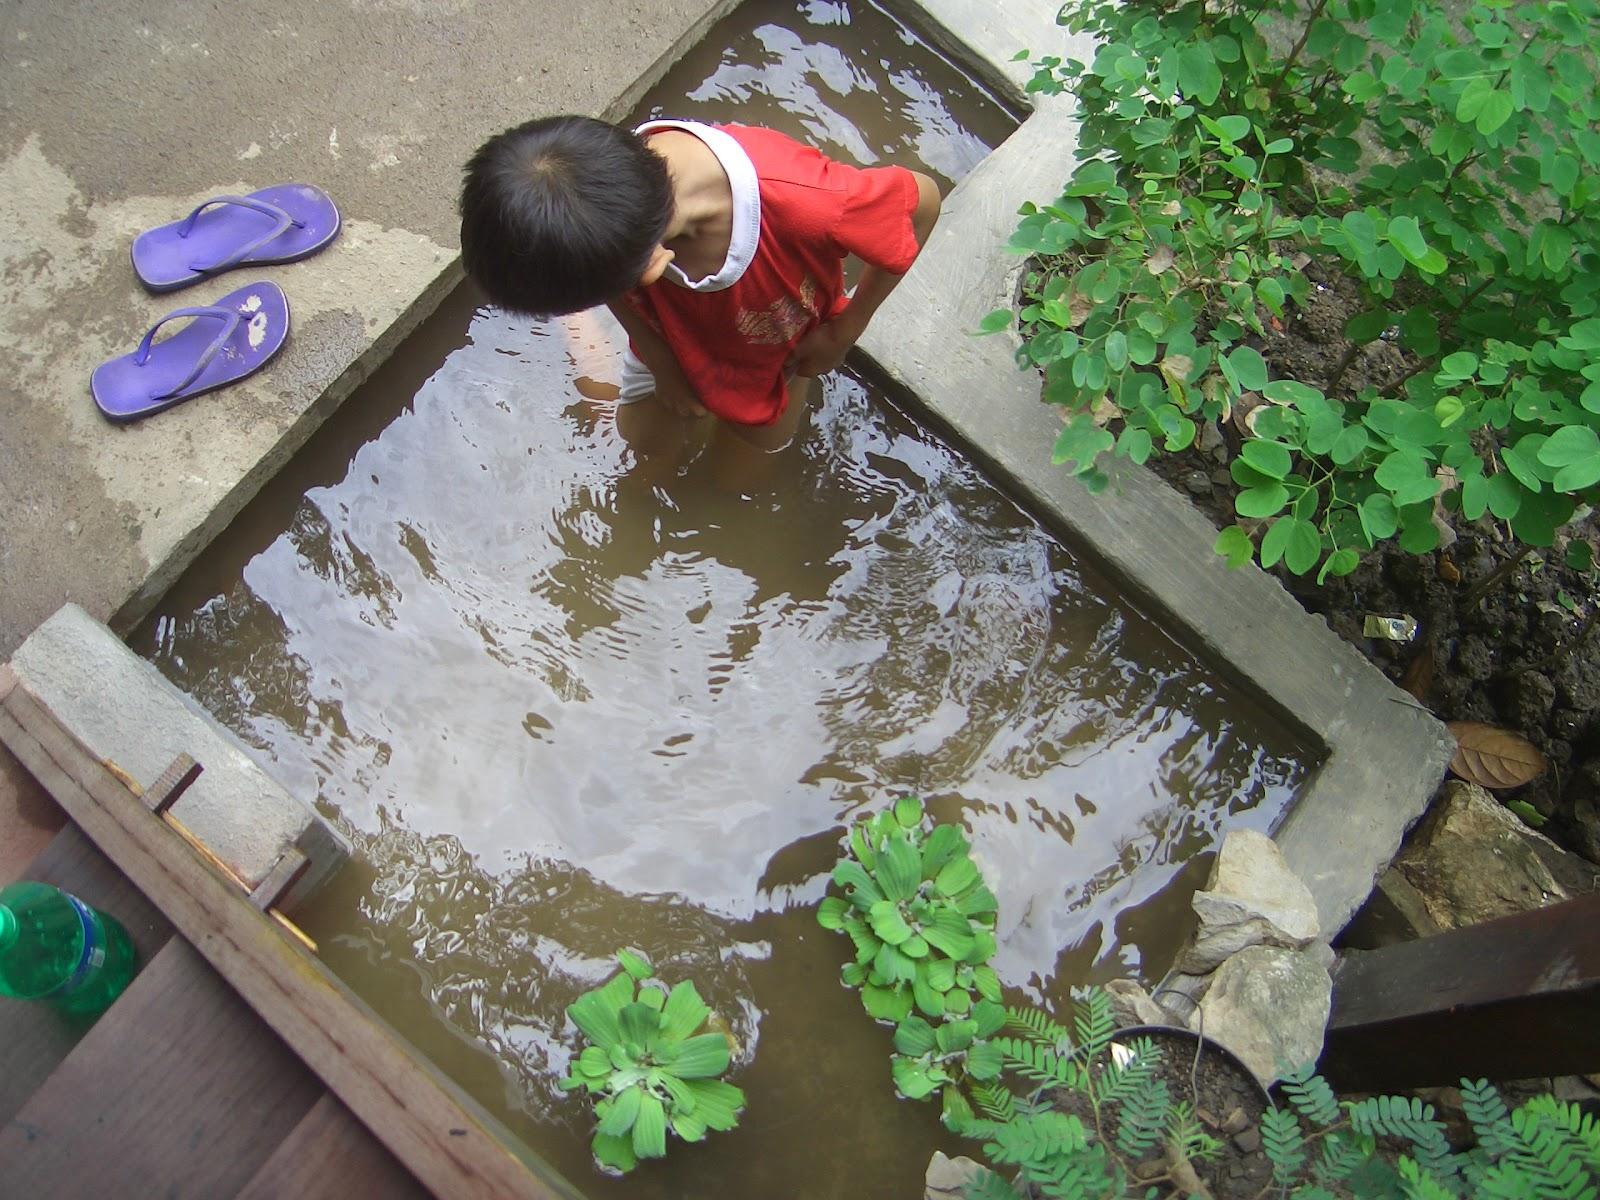 Al Ghozi anak SD Jadi Ikan kolam : essay news